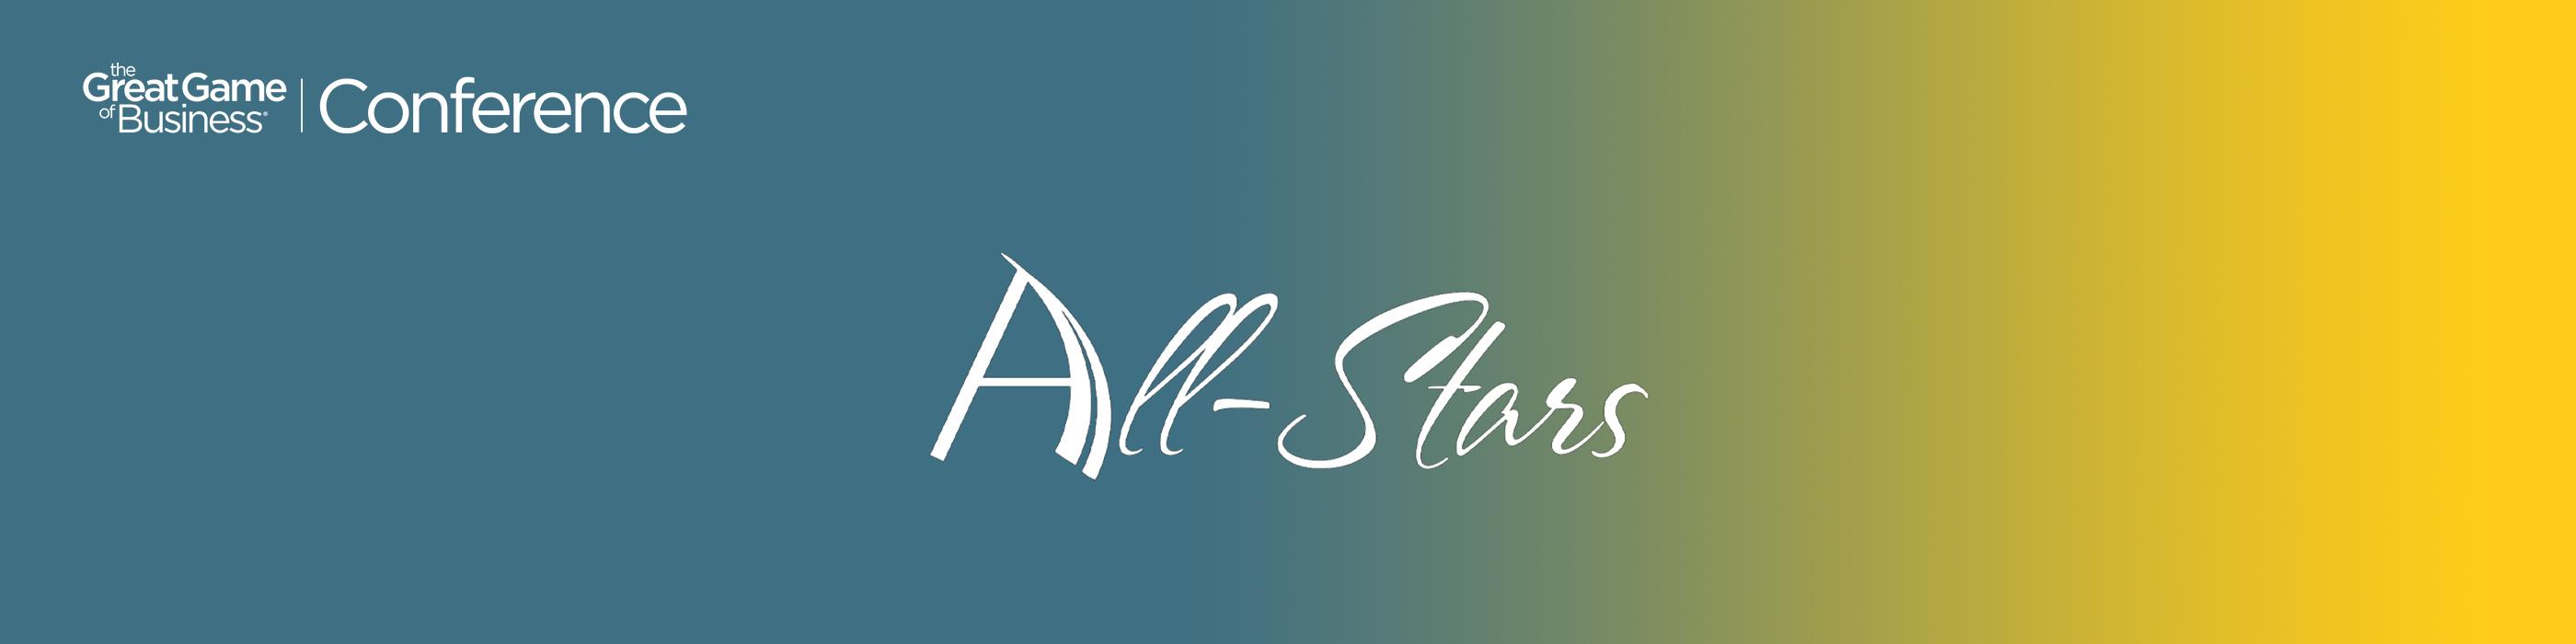 All=Star Landing Page Header